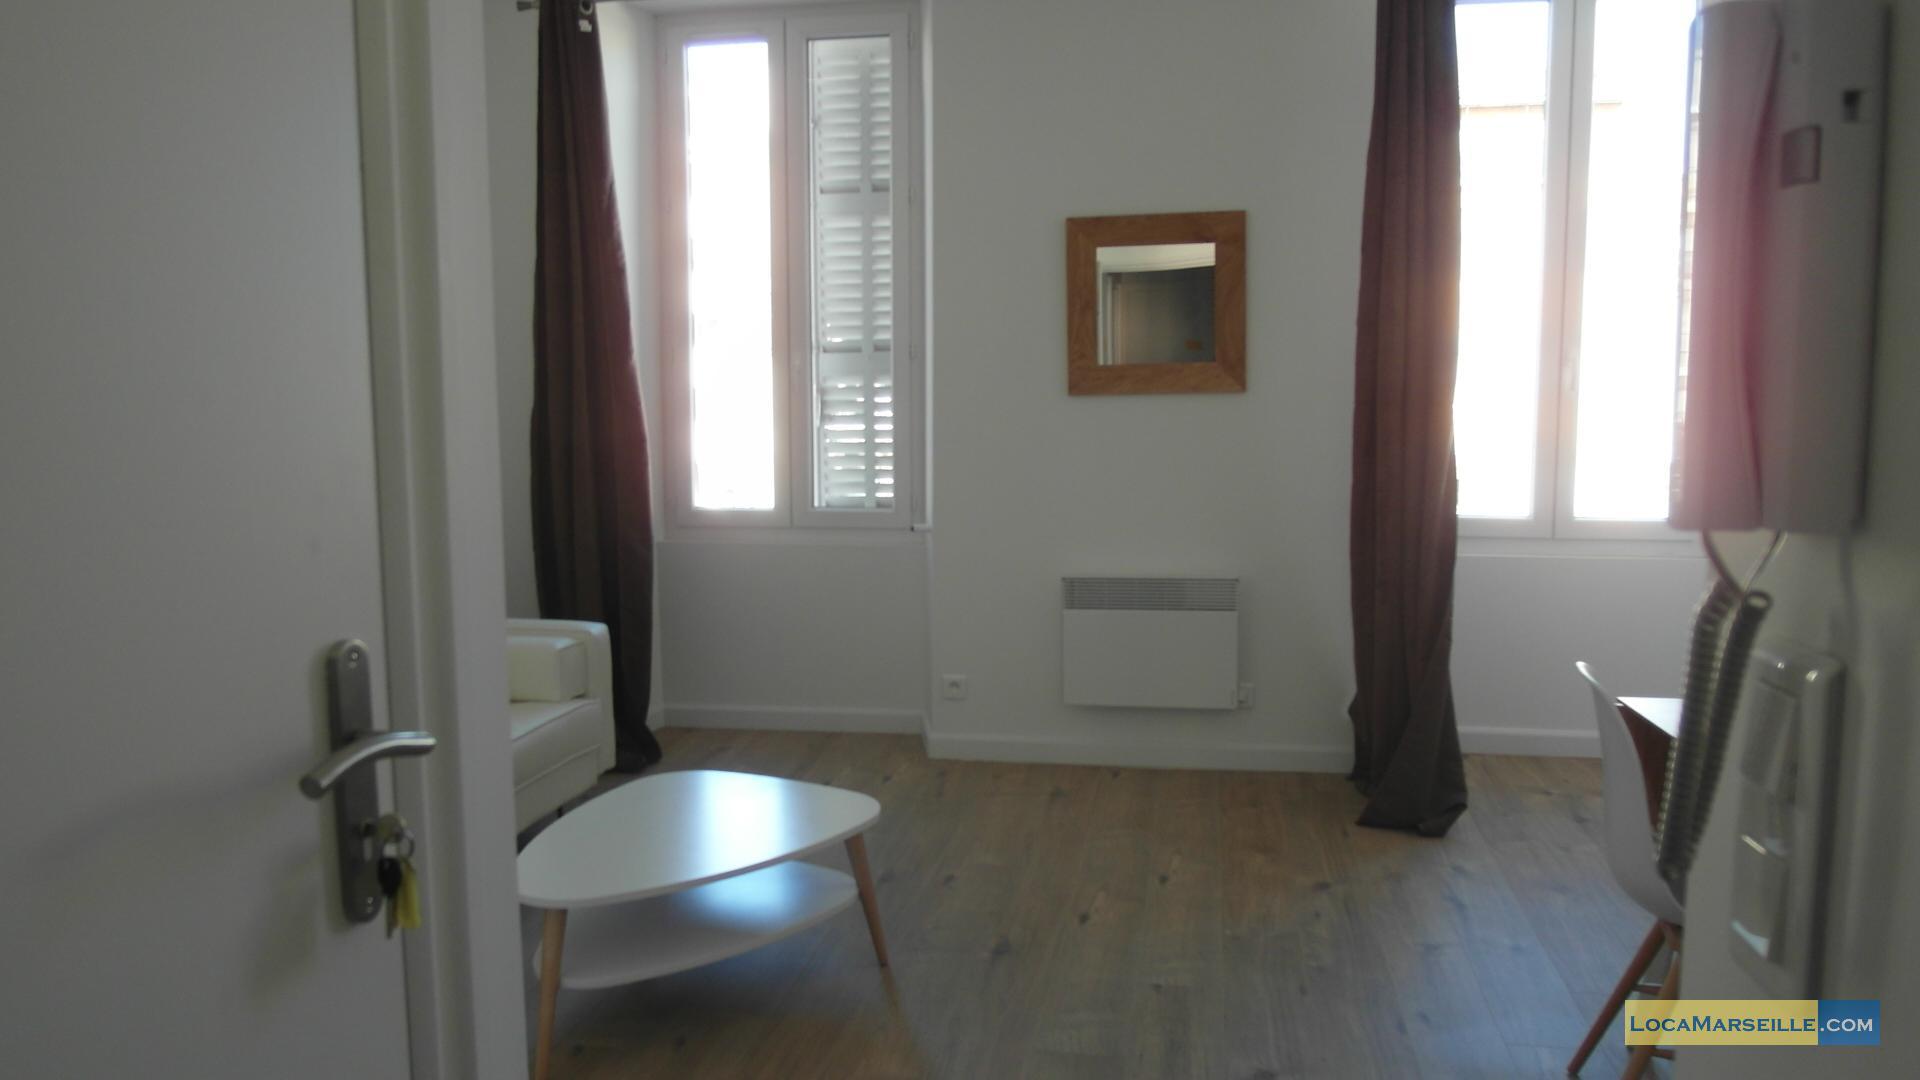 marseille location meubl e appartement type t1 fjord. Black Bedroom Furniture Sets. Home Design Ideas